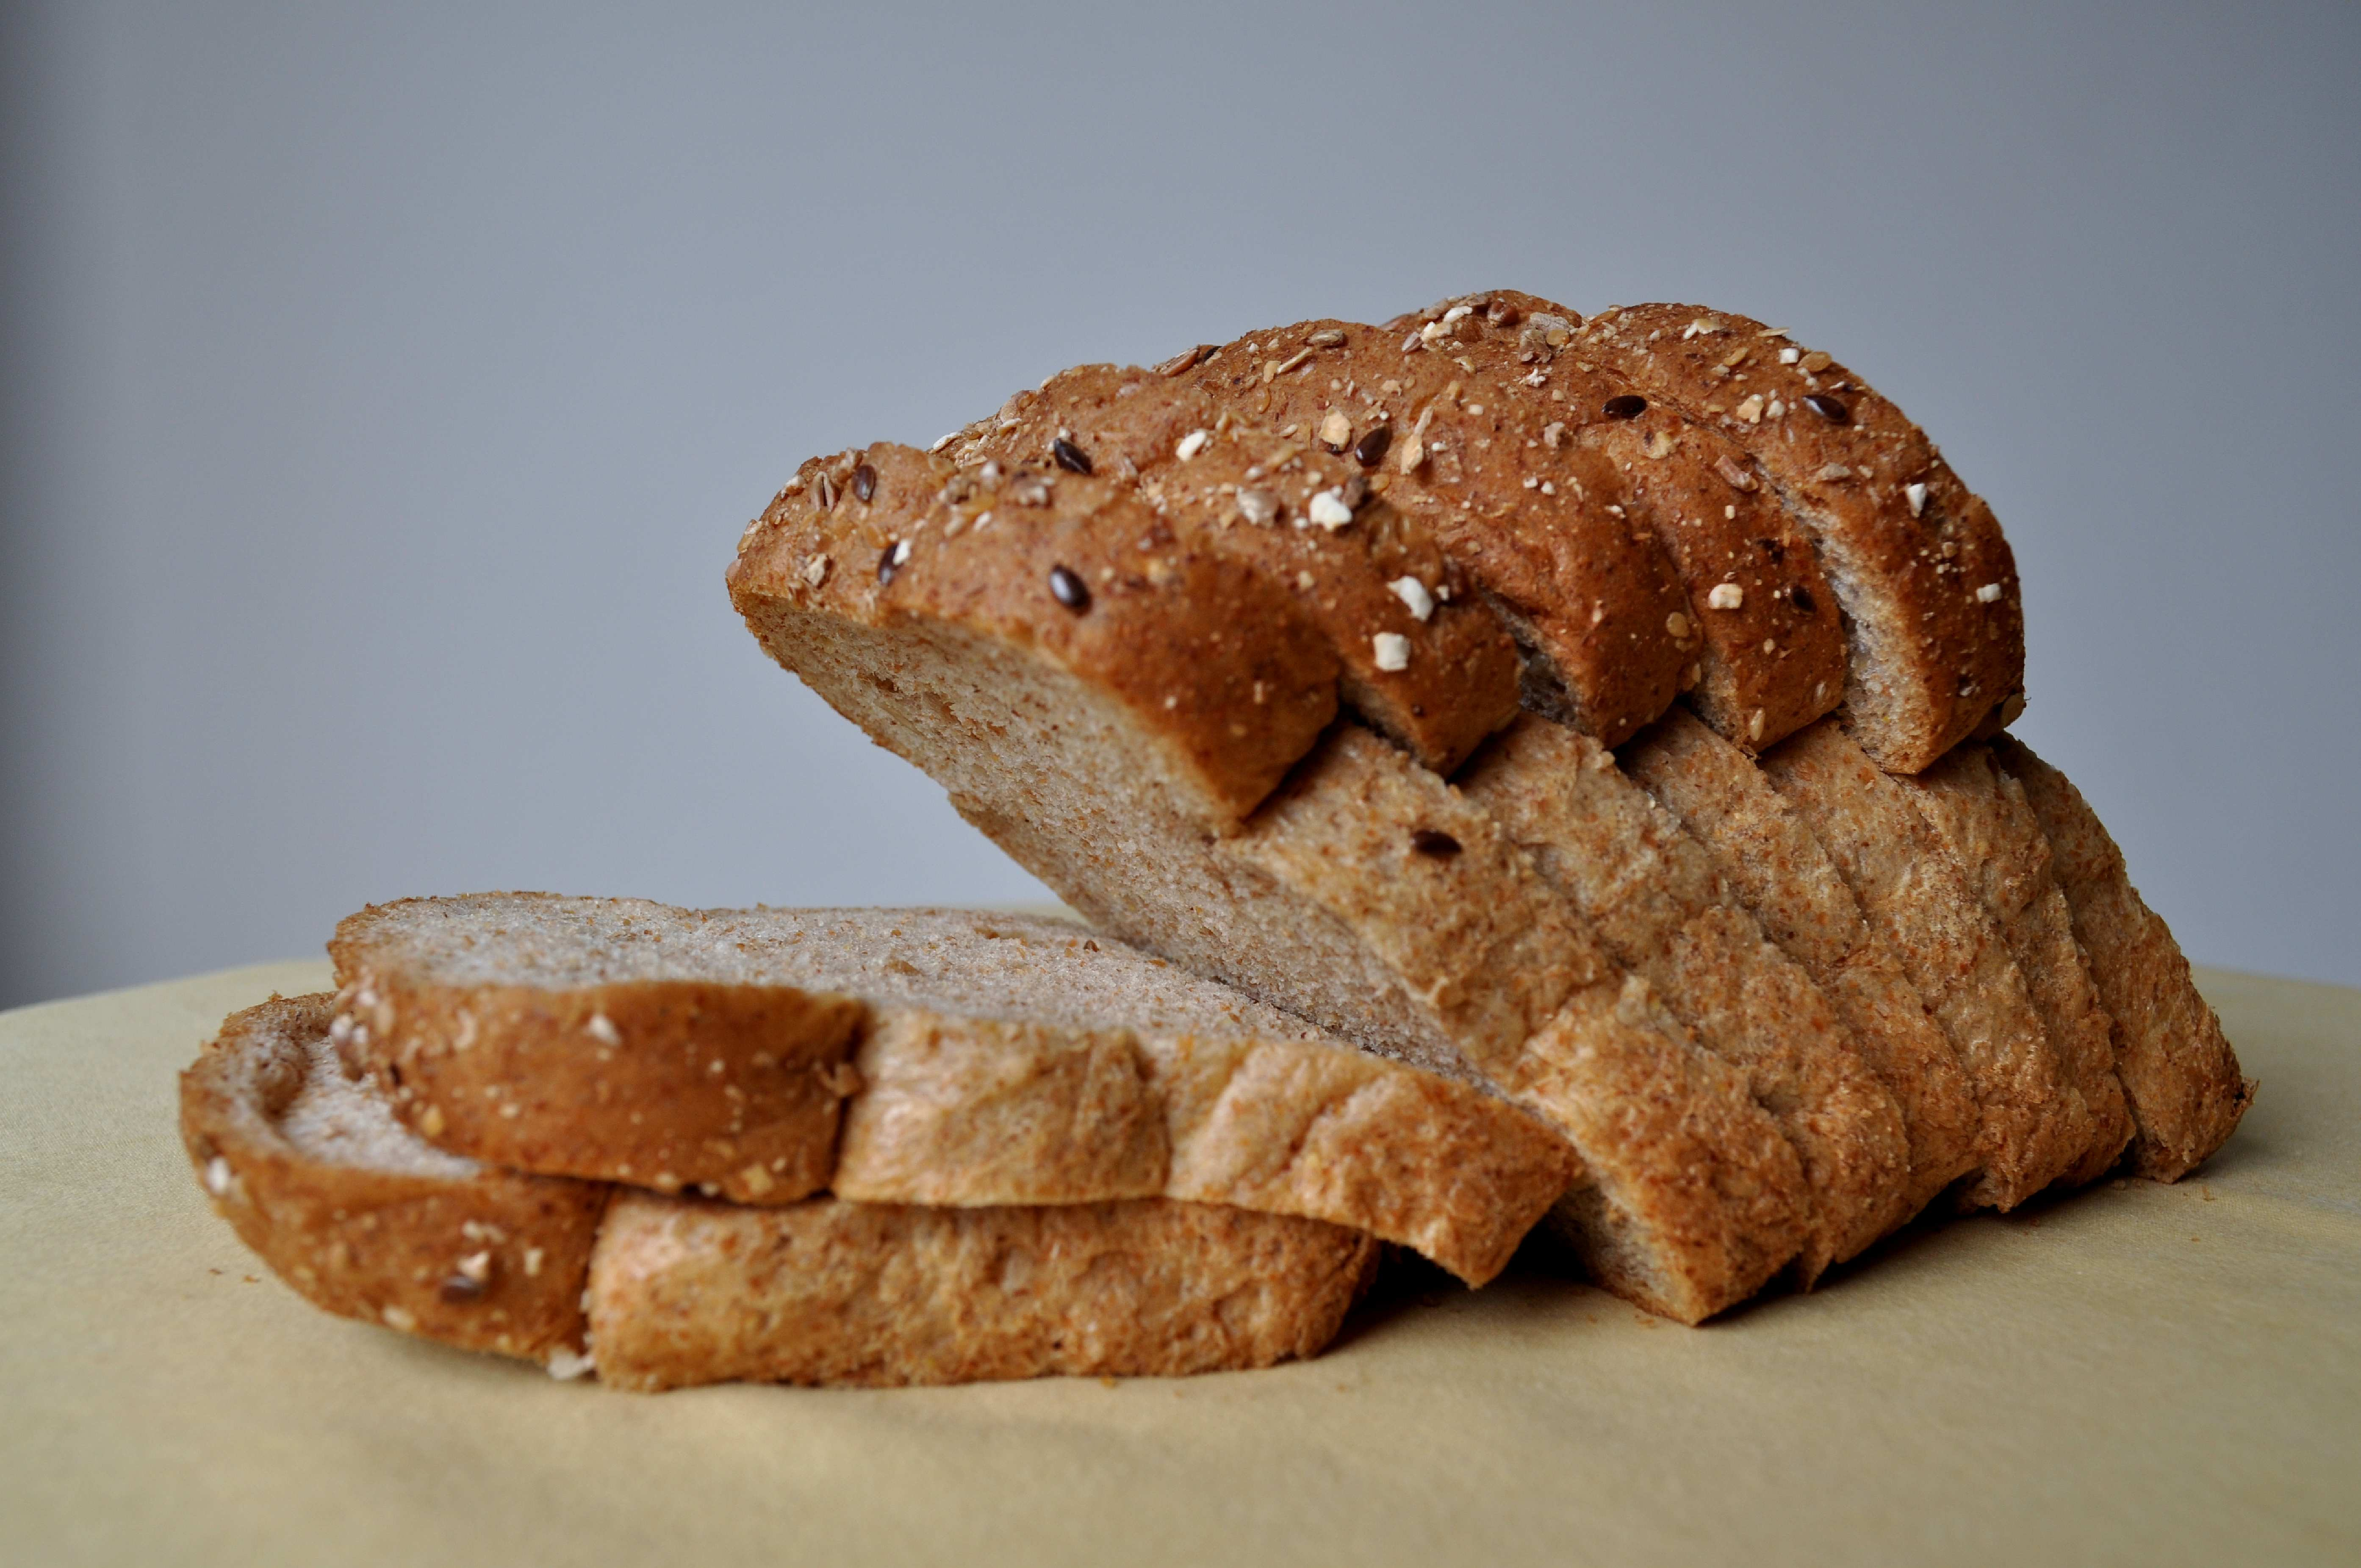 Free photograph; high, quality, wholemeal, bread, wheat, barley, oats, buckwheat